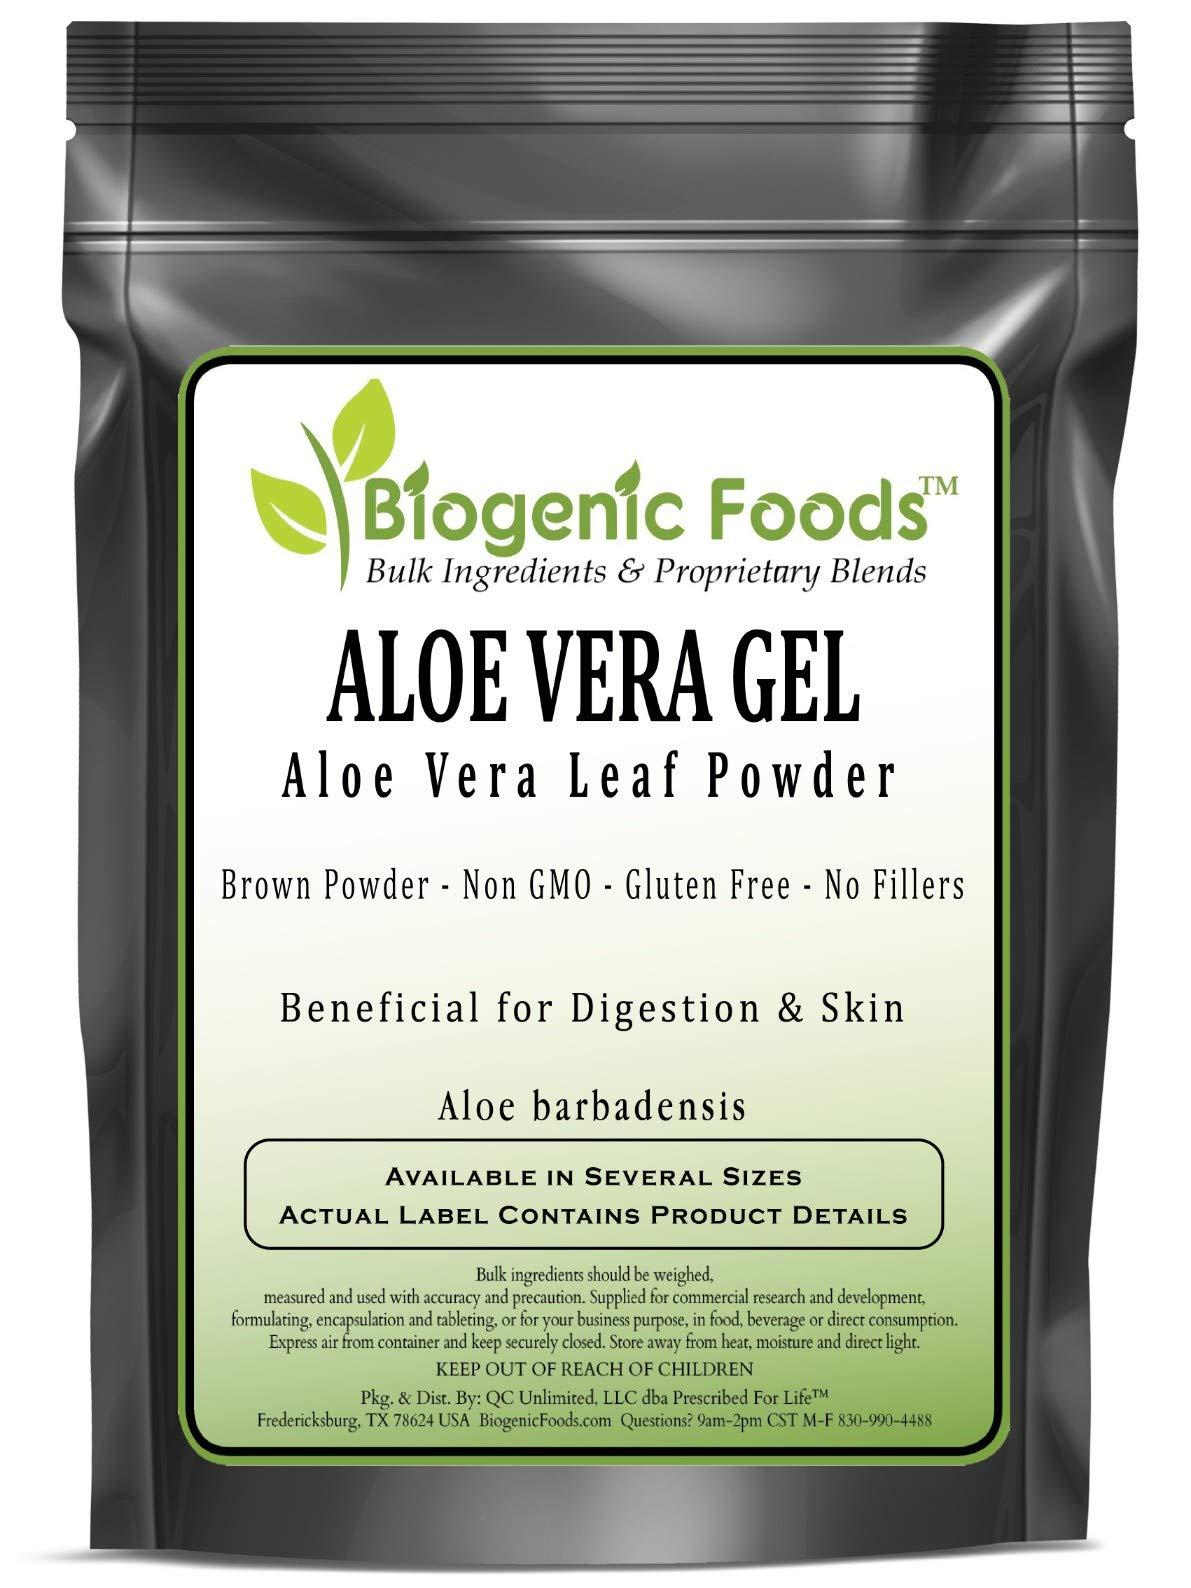 Aloe Vera Gel -Aloe Vera Leaf Powder (Aloe barbadensis), 10 kg